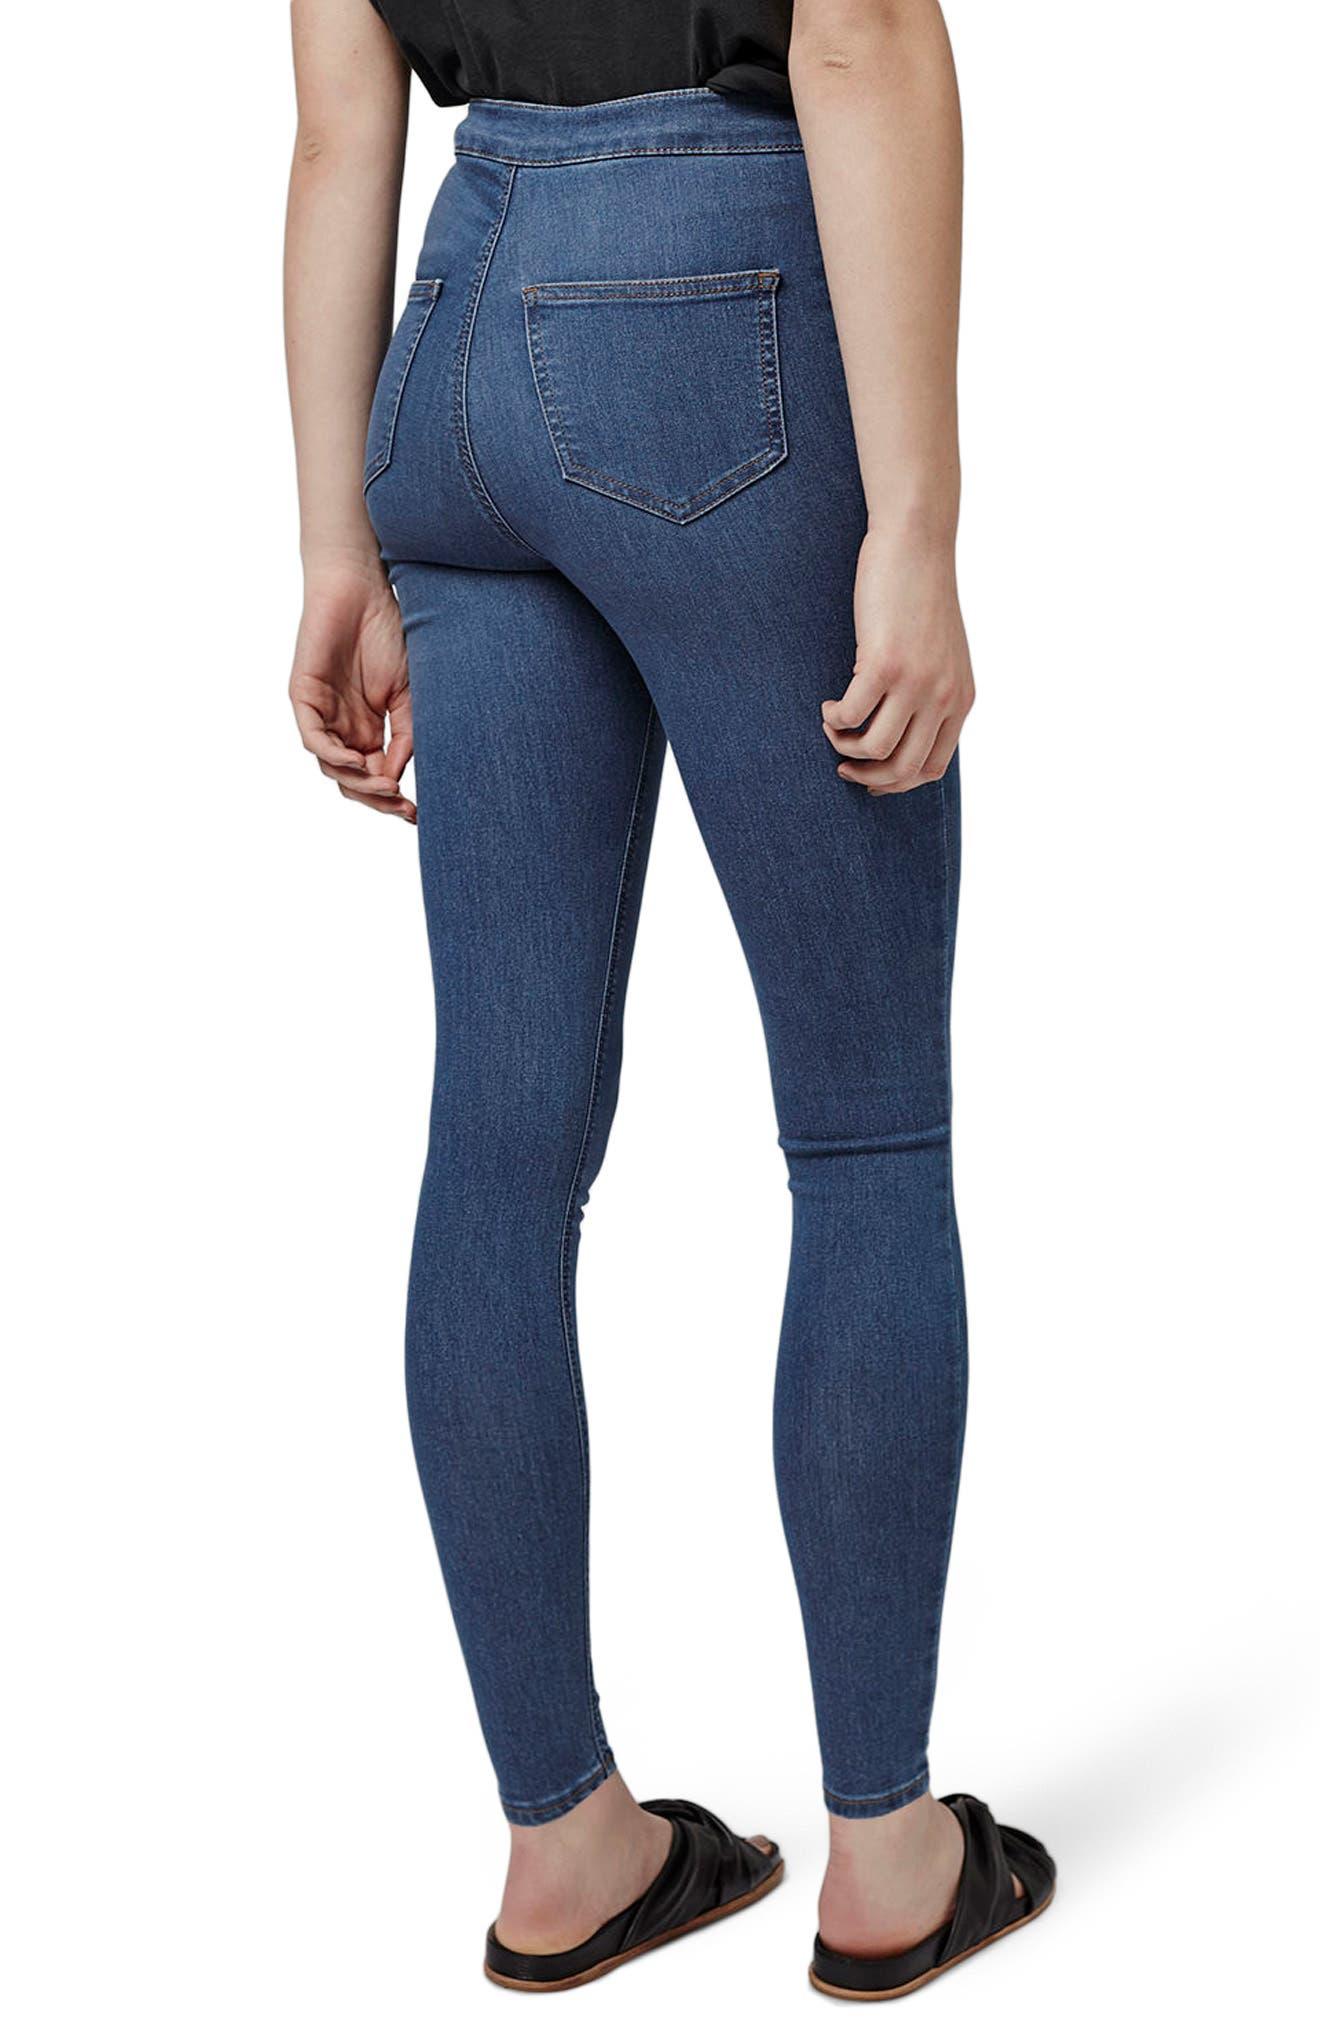 TOPSHOP, Joni Mid Denim Jeans, Alternate thumbnail 2, color, MID DENIM